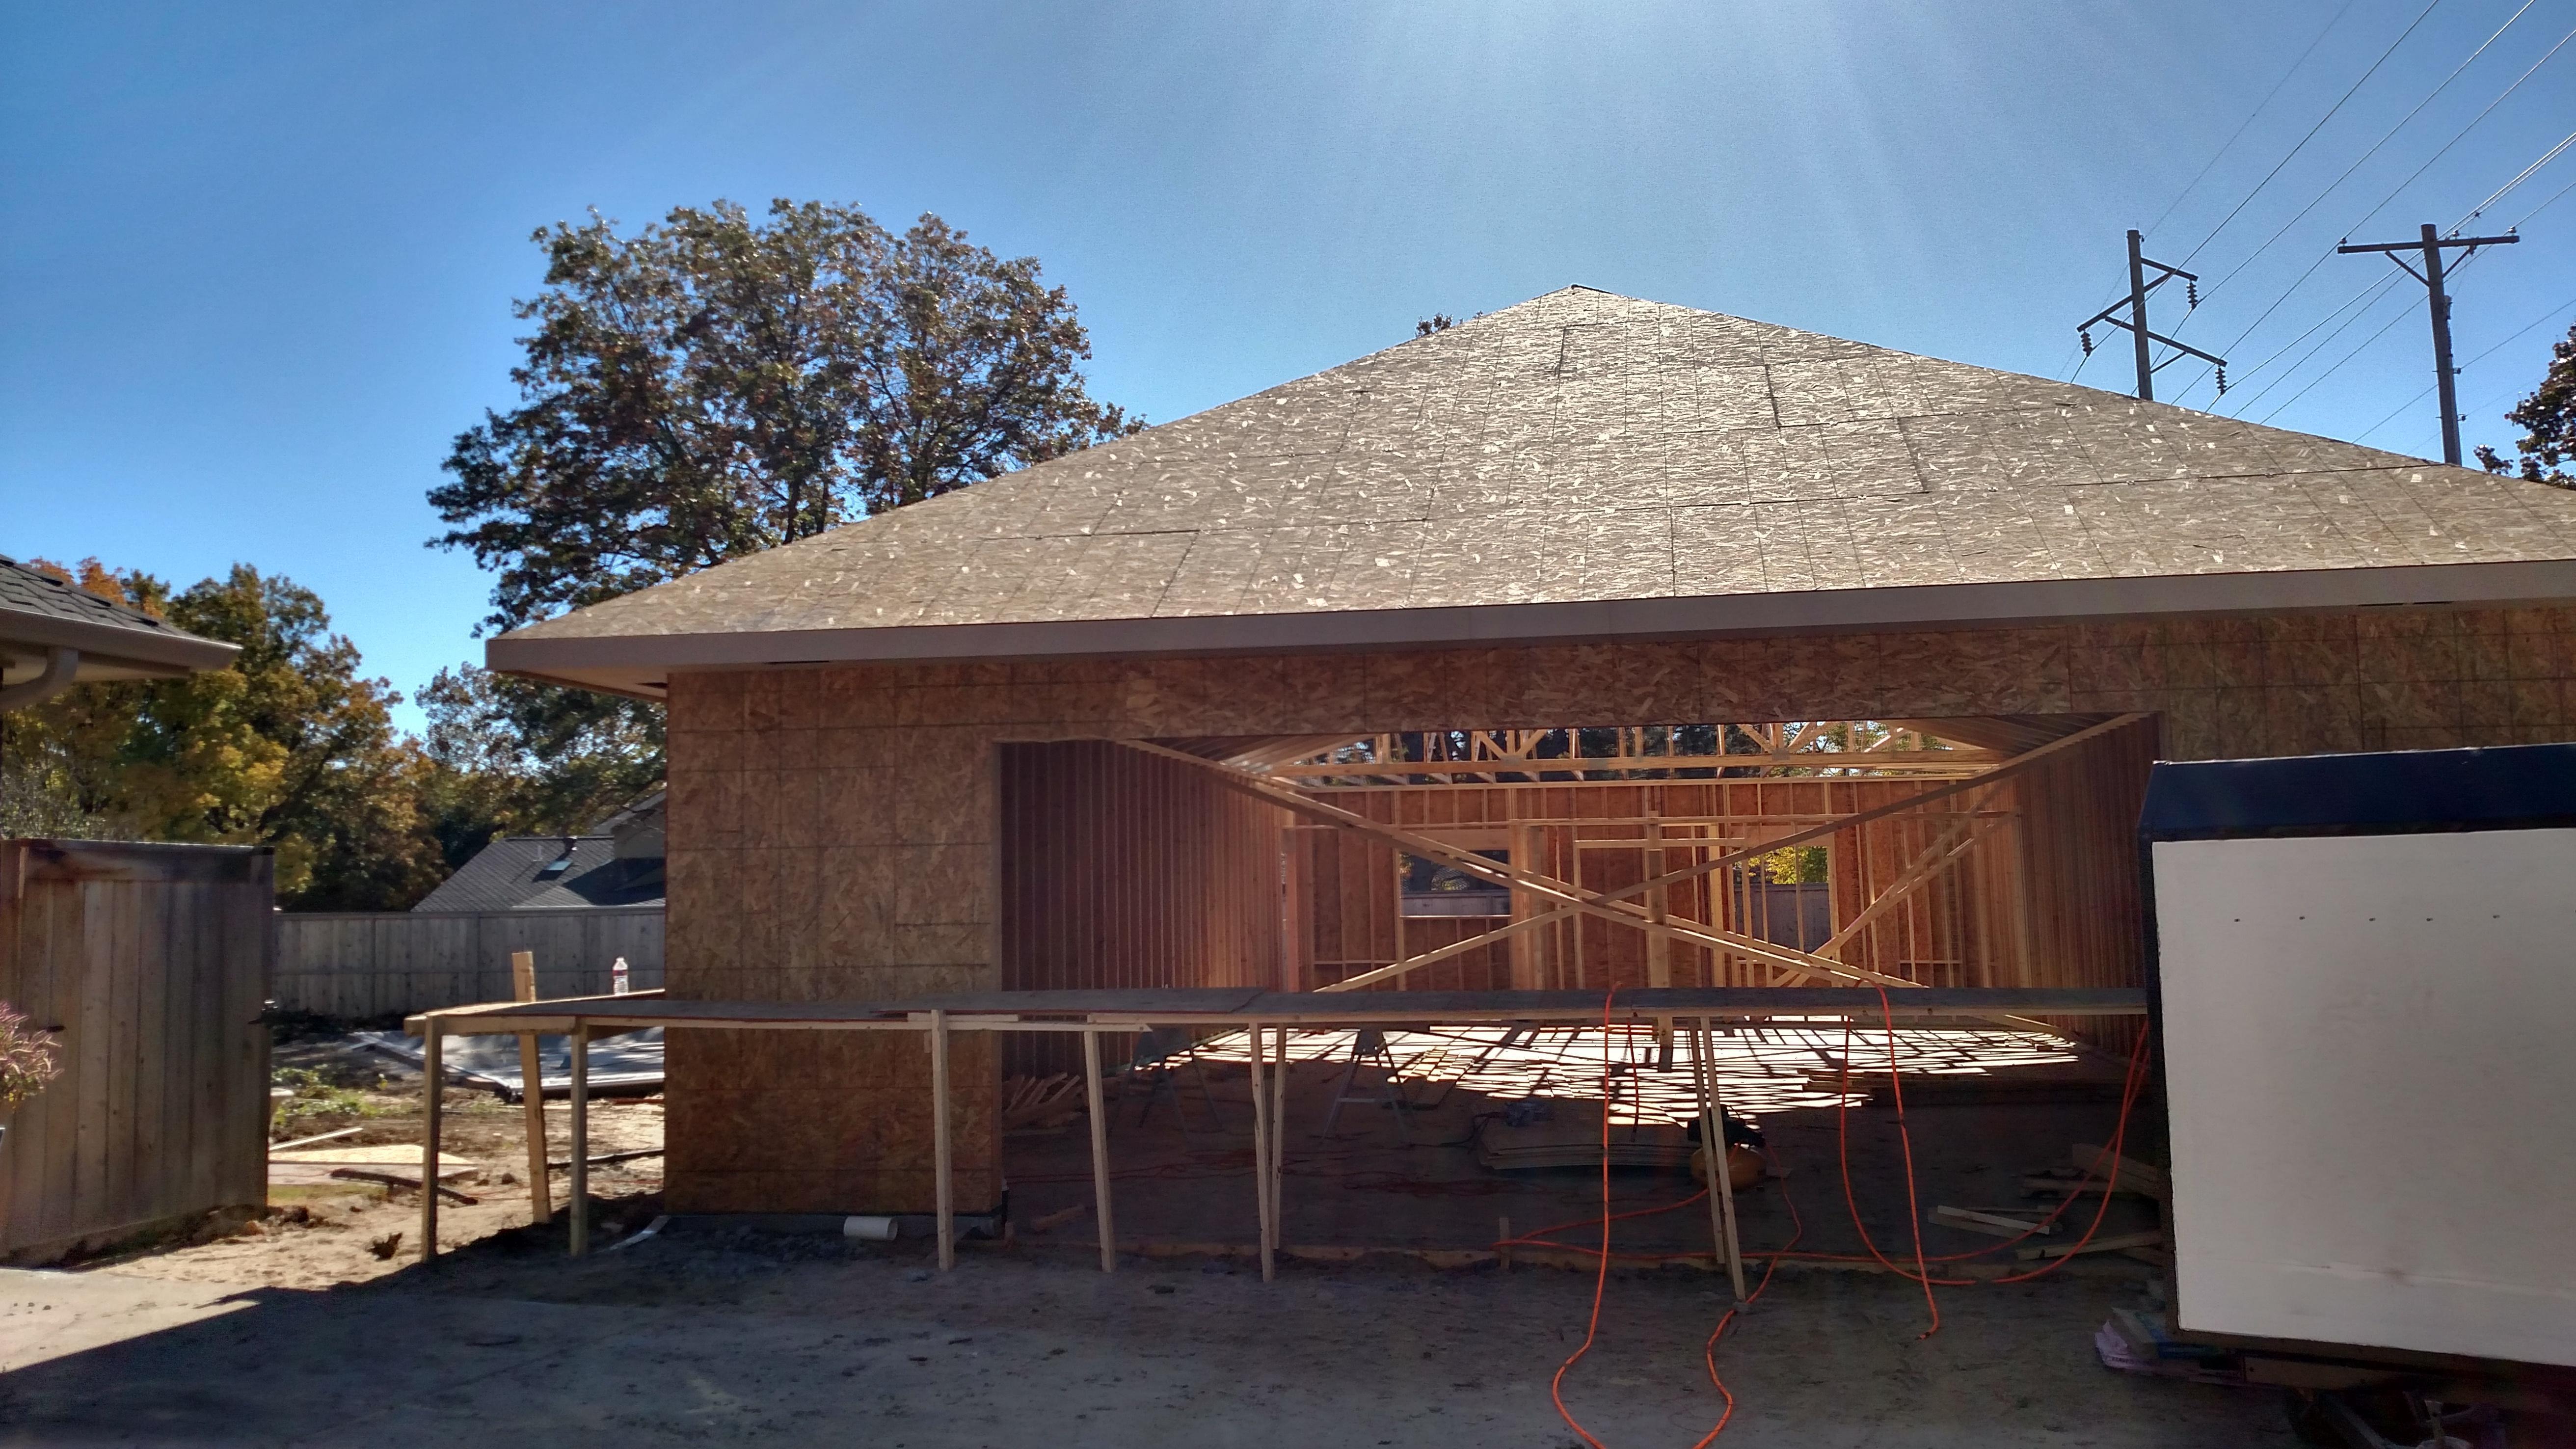 Helping hands construction in wichita ks 67217 for Builders in wichita ks